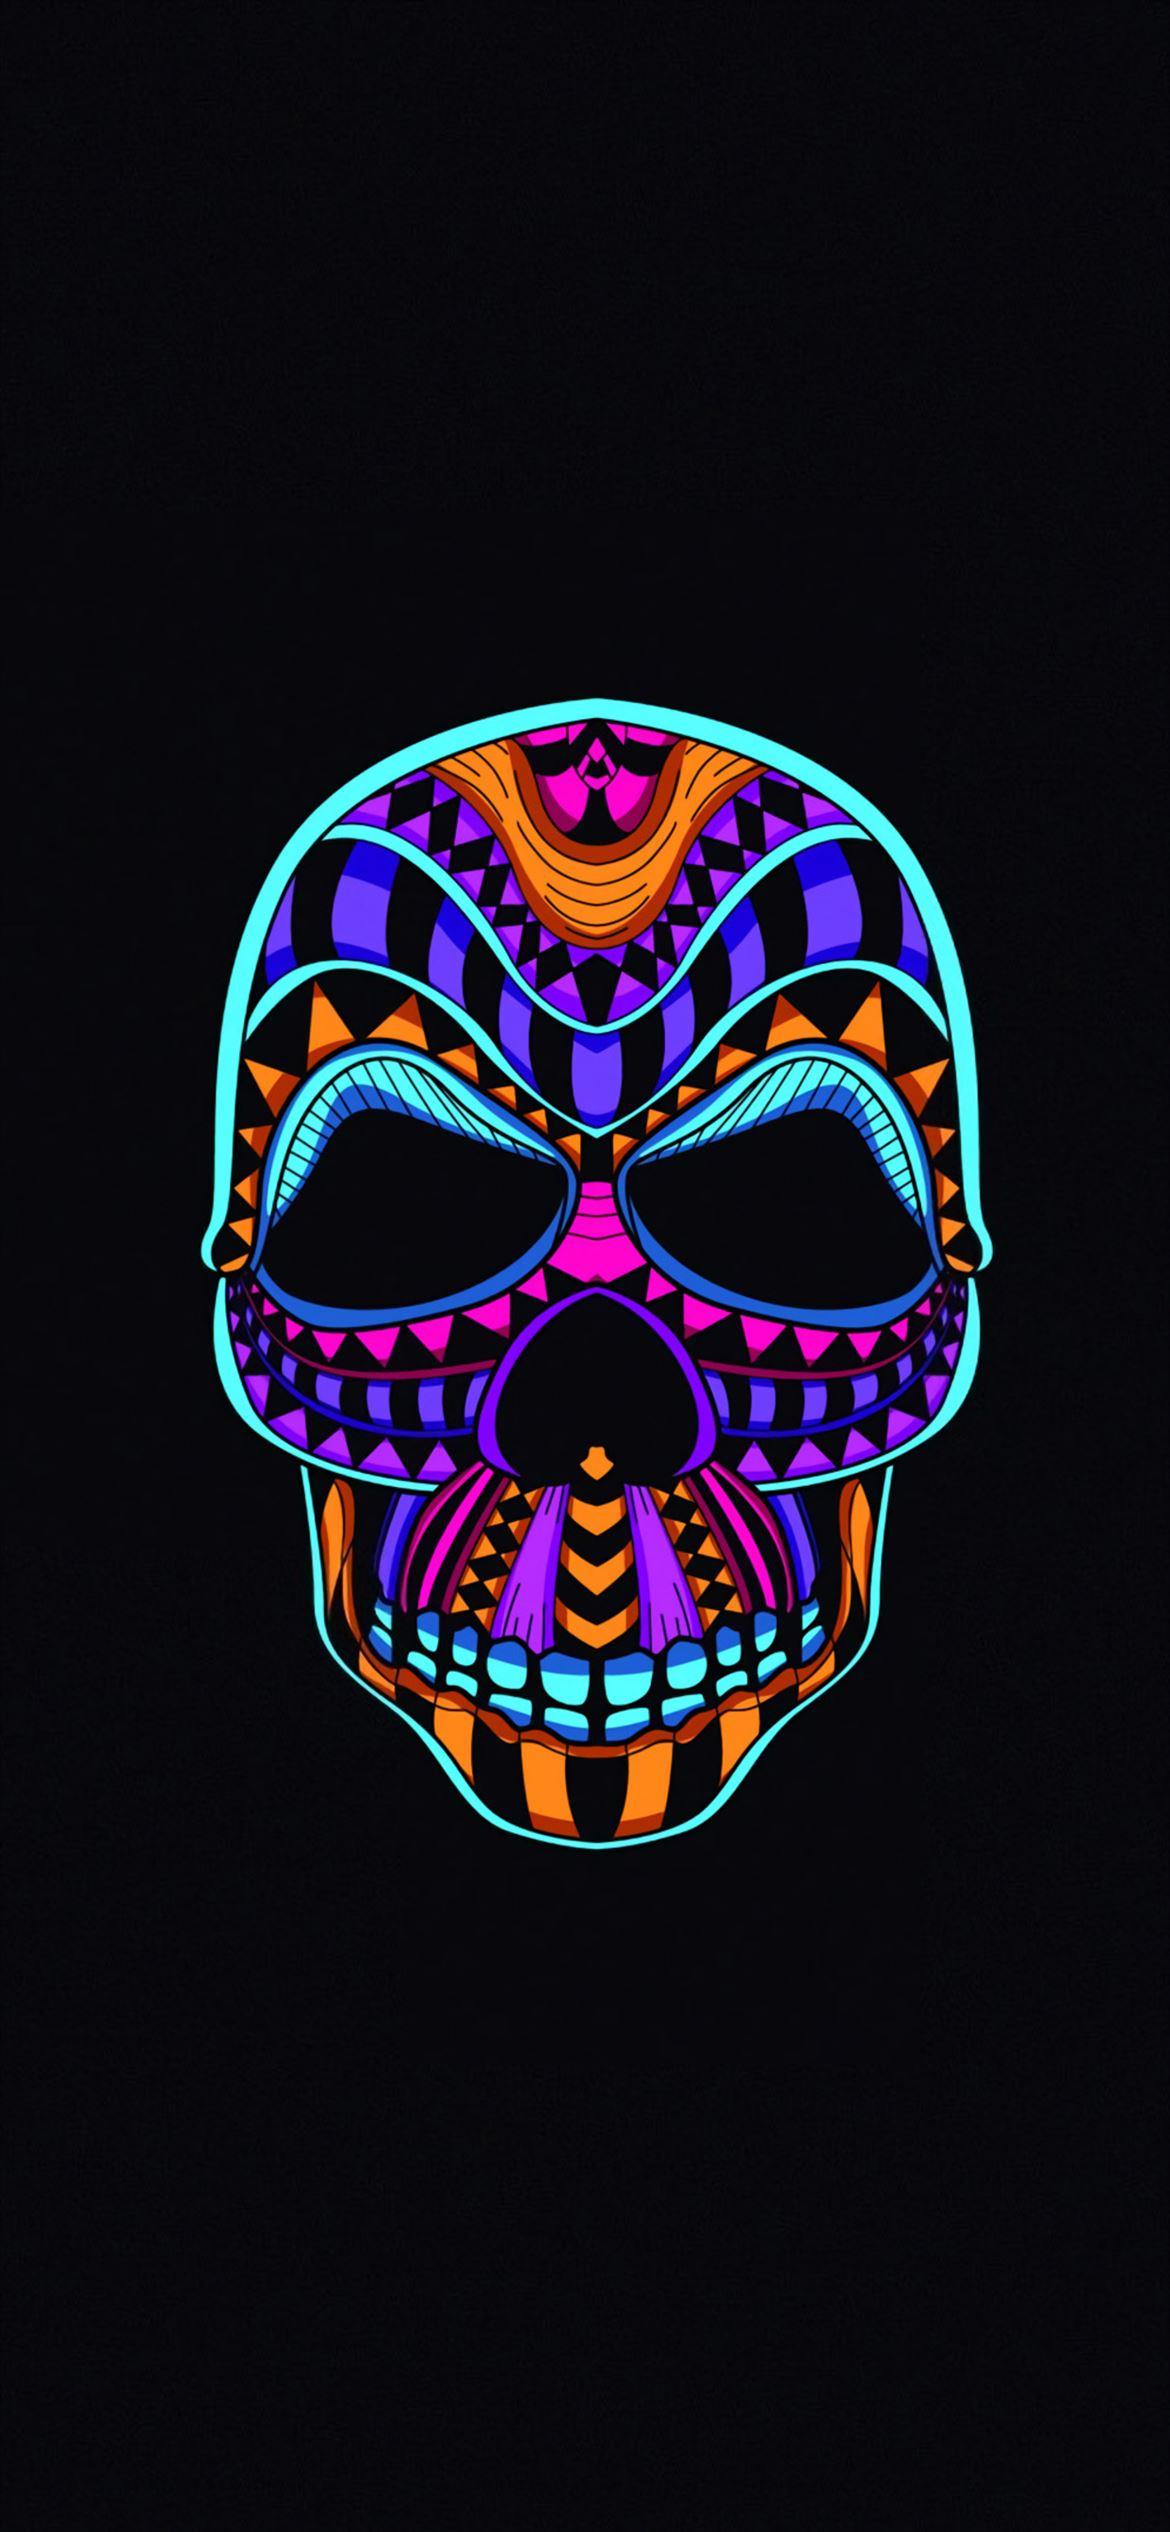 skull dark minimal 4k iPhone 12 Wallpapers Download 1170x2532